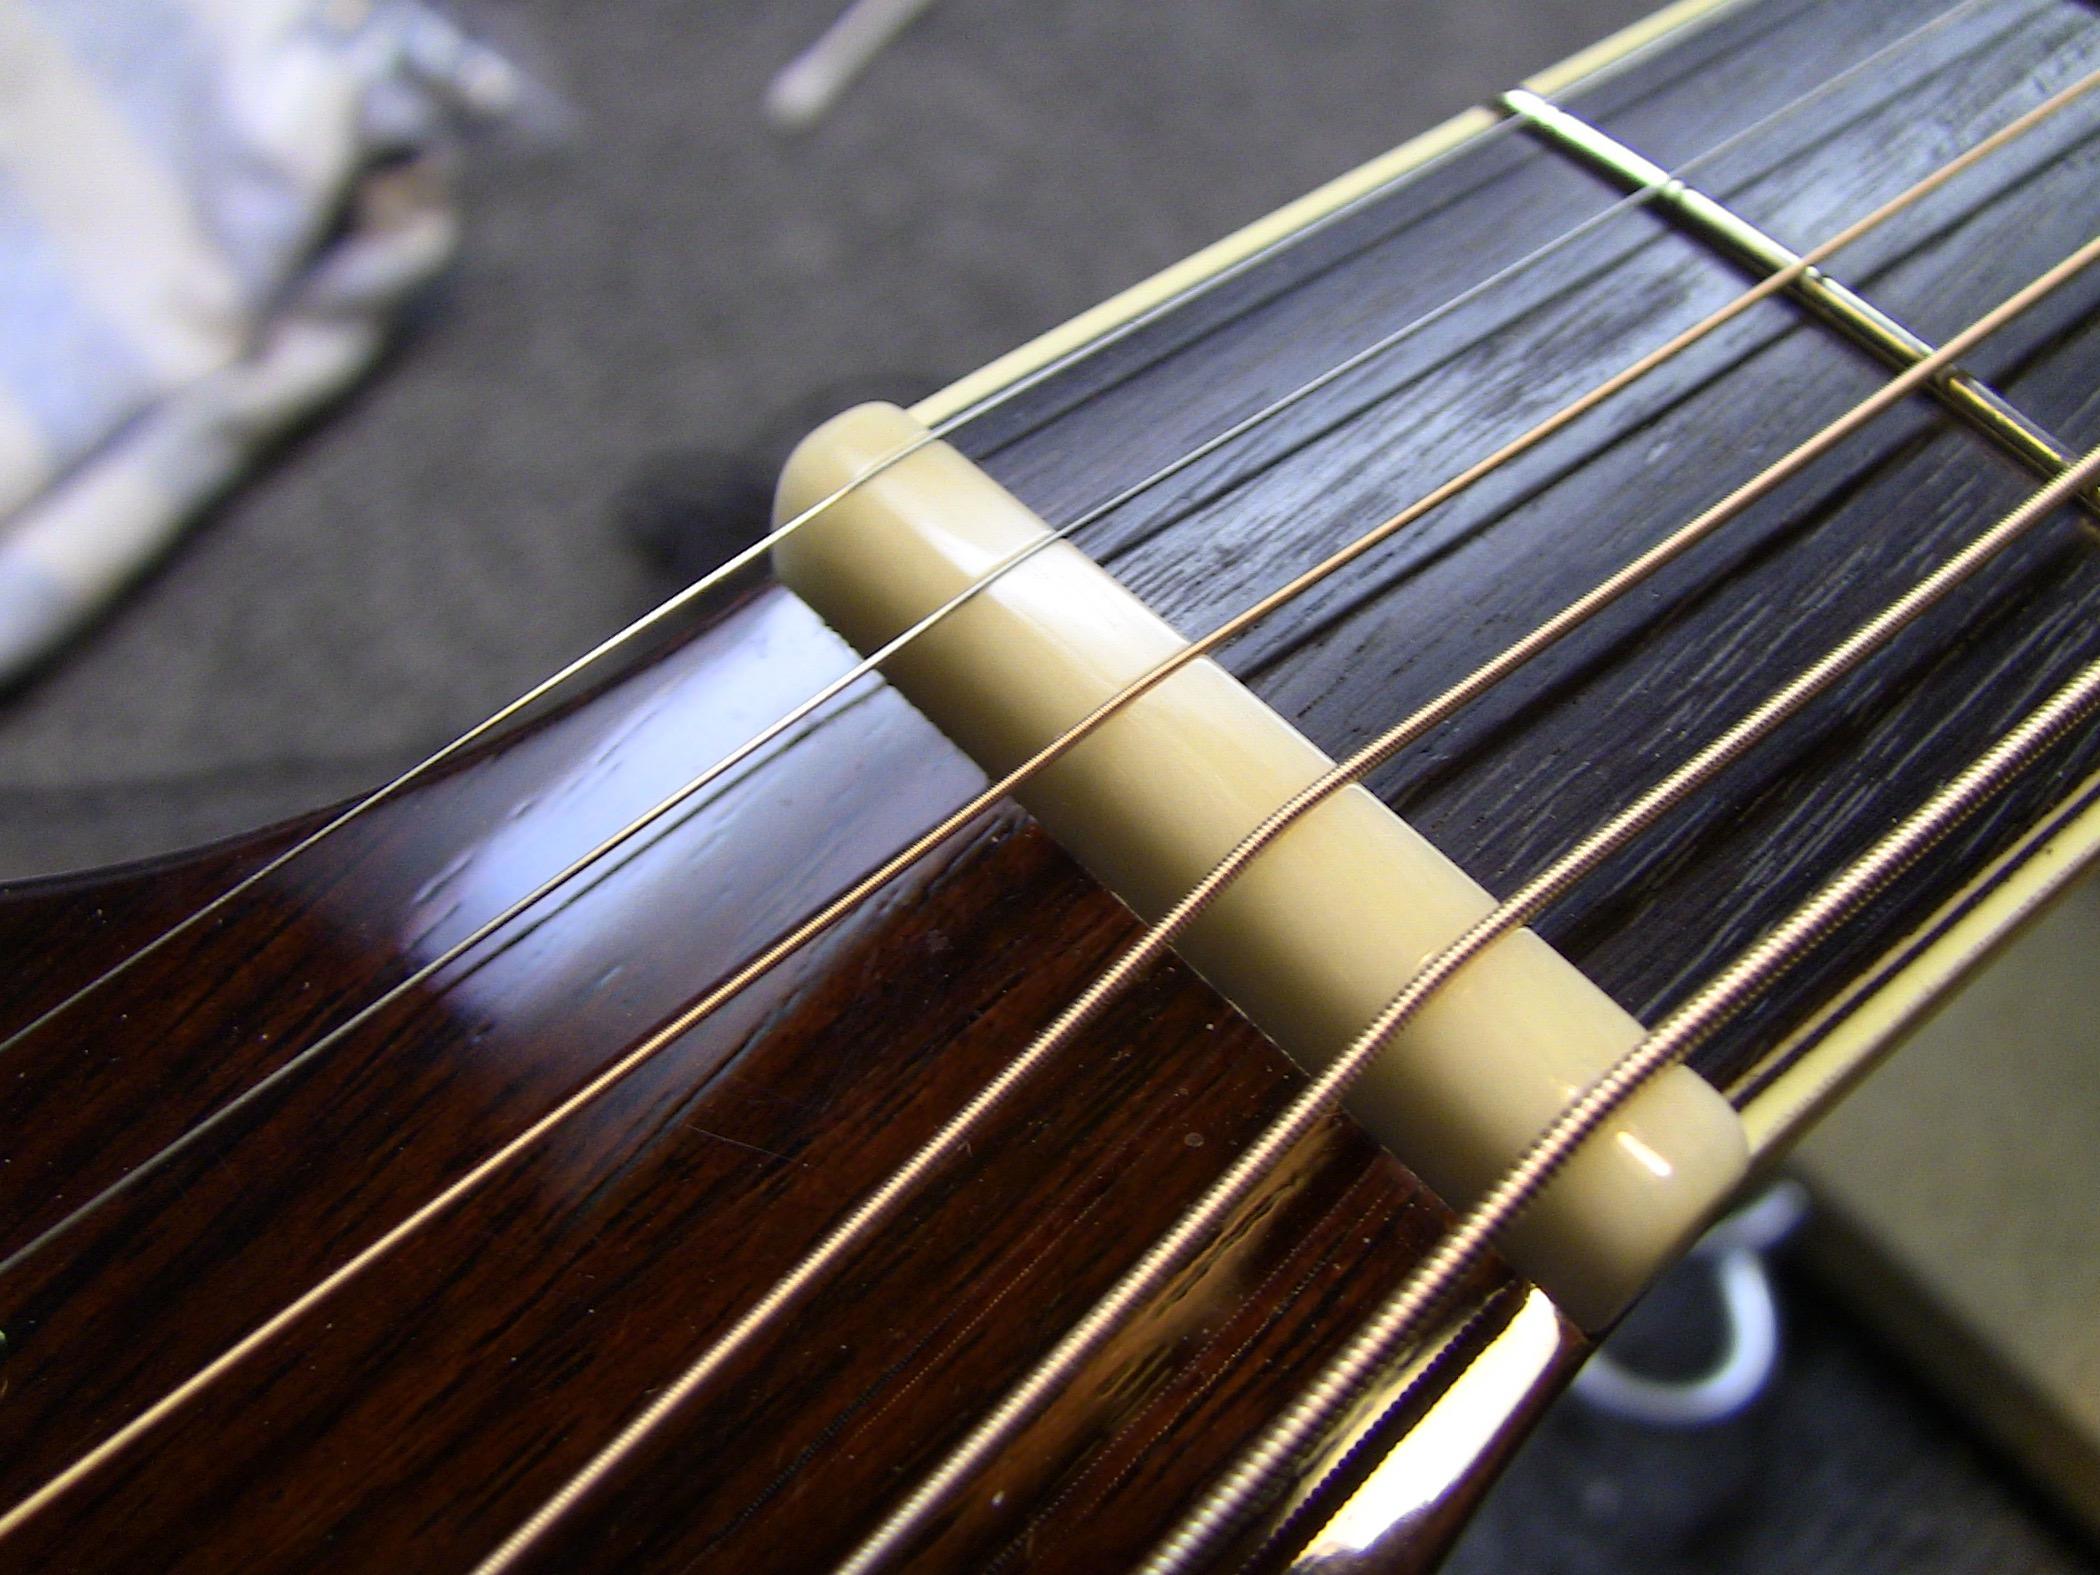 guitar nut replacement. Black Bedroom Furniture Sets. Home Design Ideas